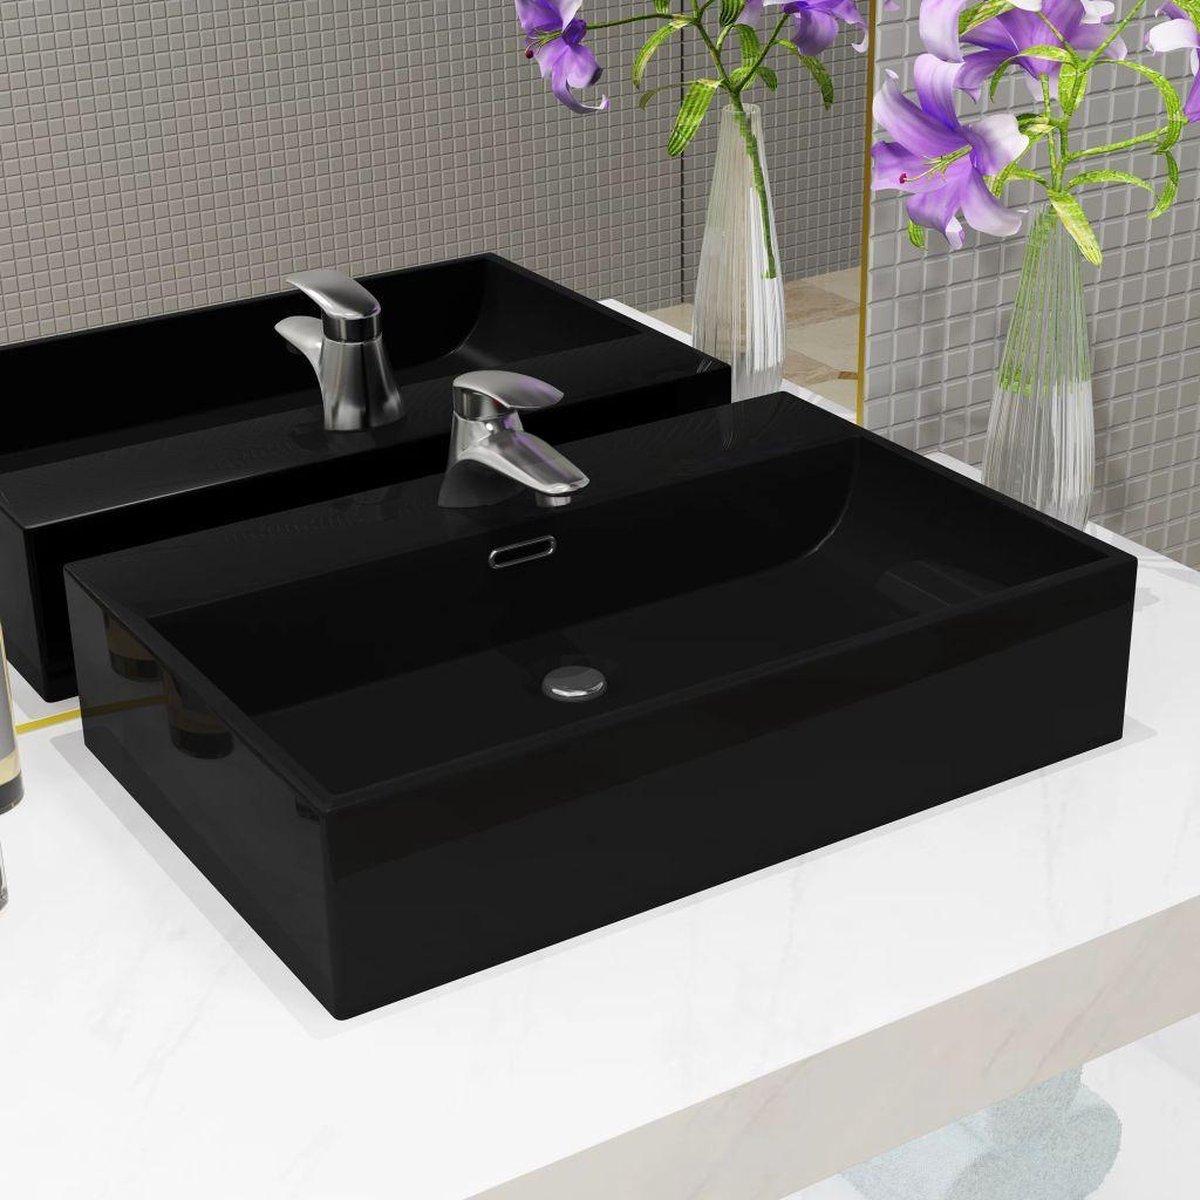 vidaXL Wastafel met kraangat 76x42,5x14,5 cm keramiek zwart